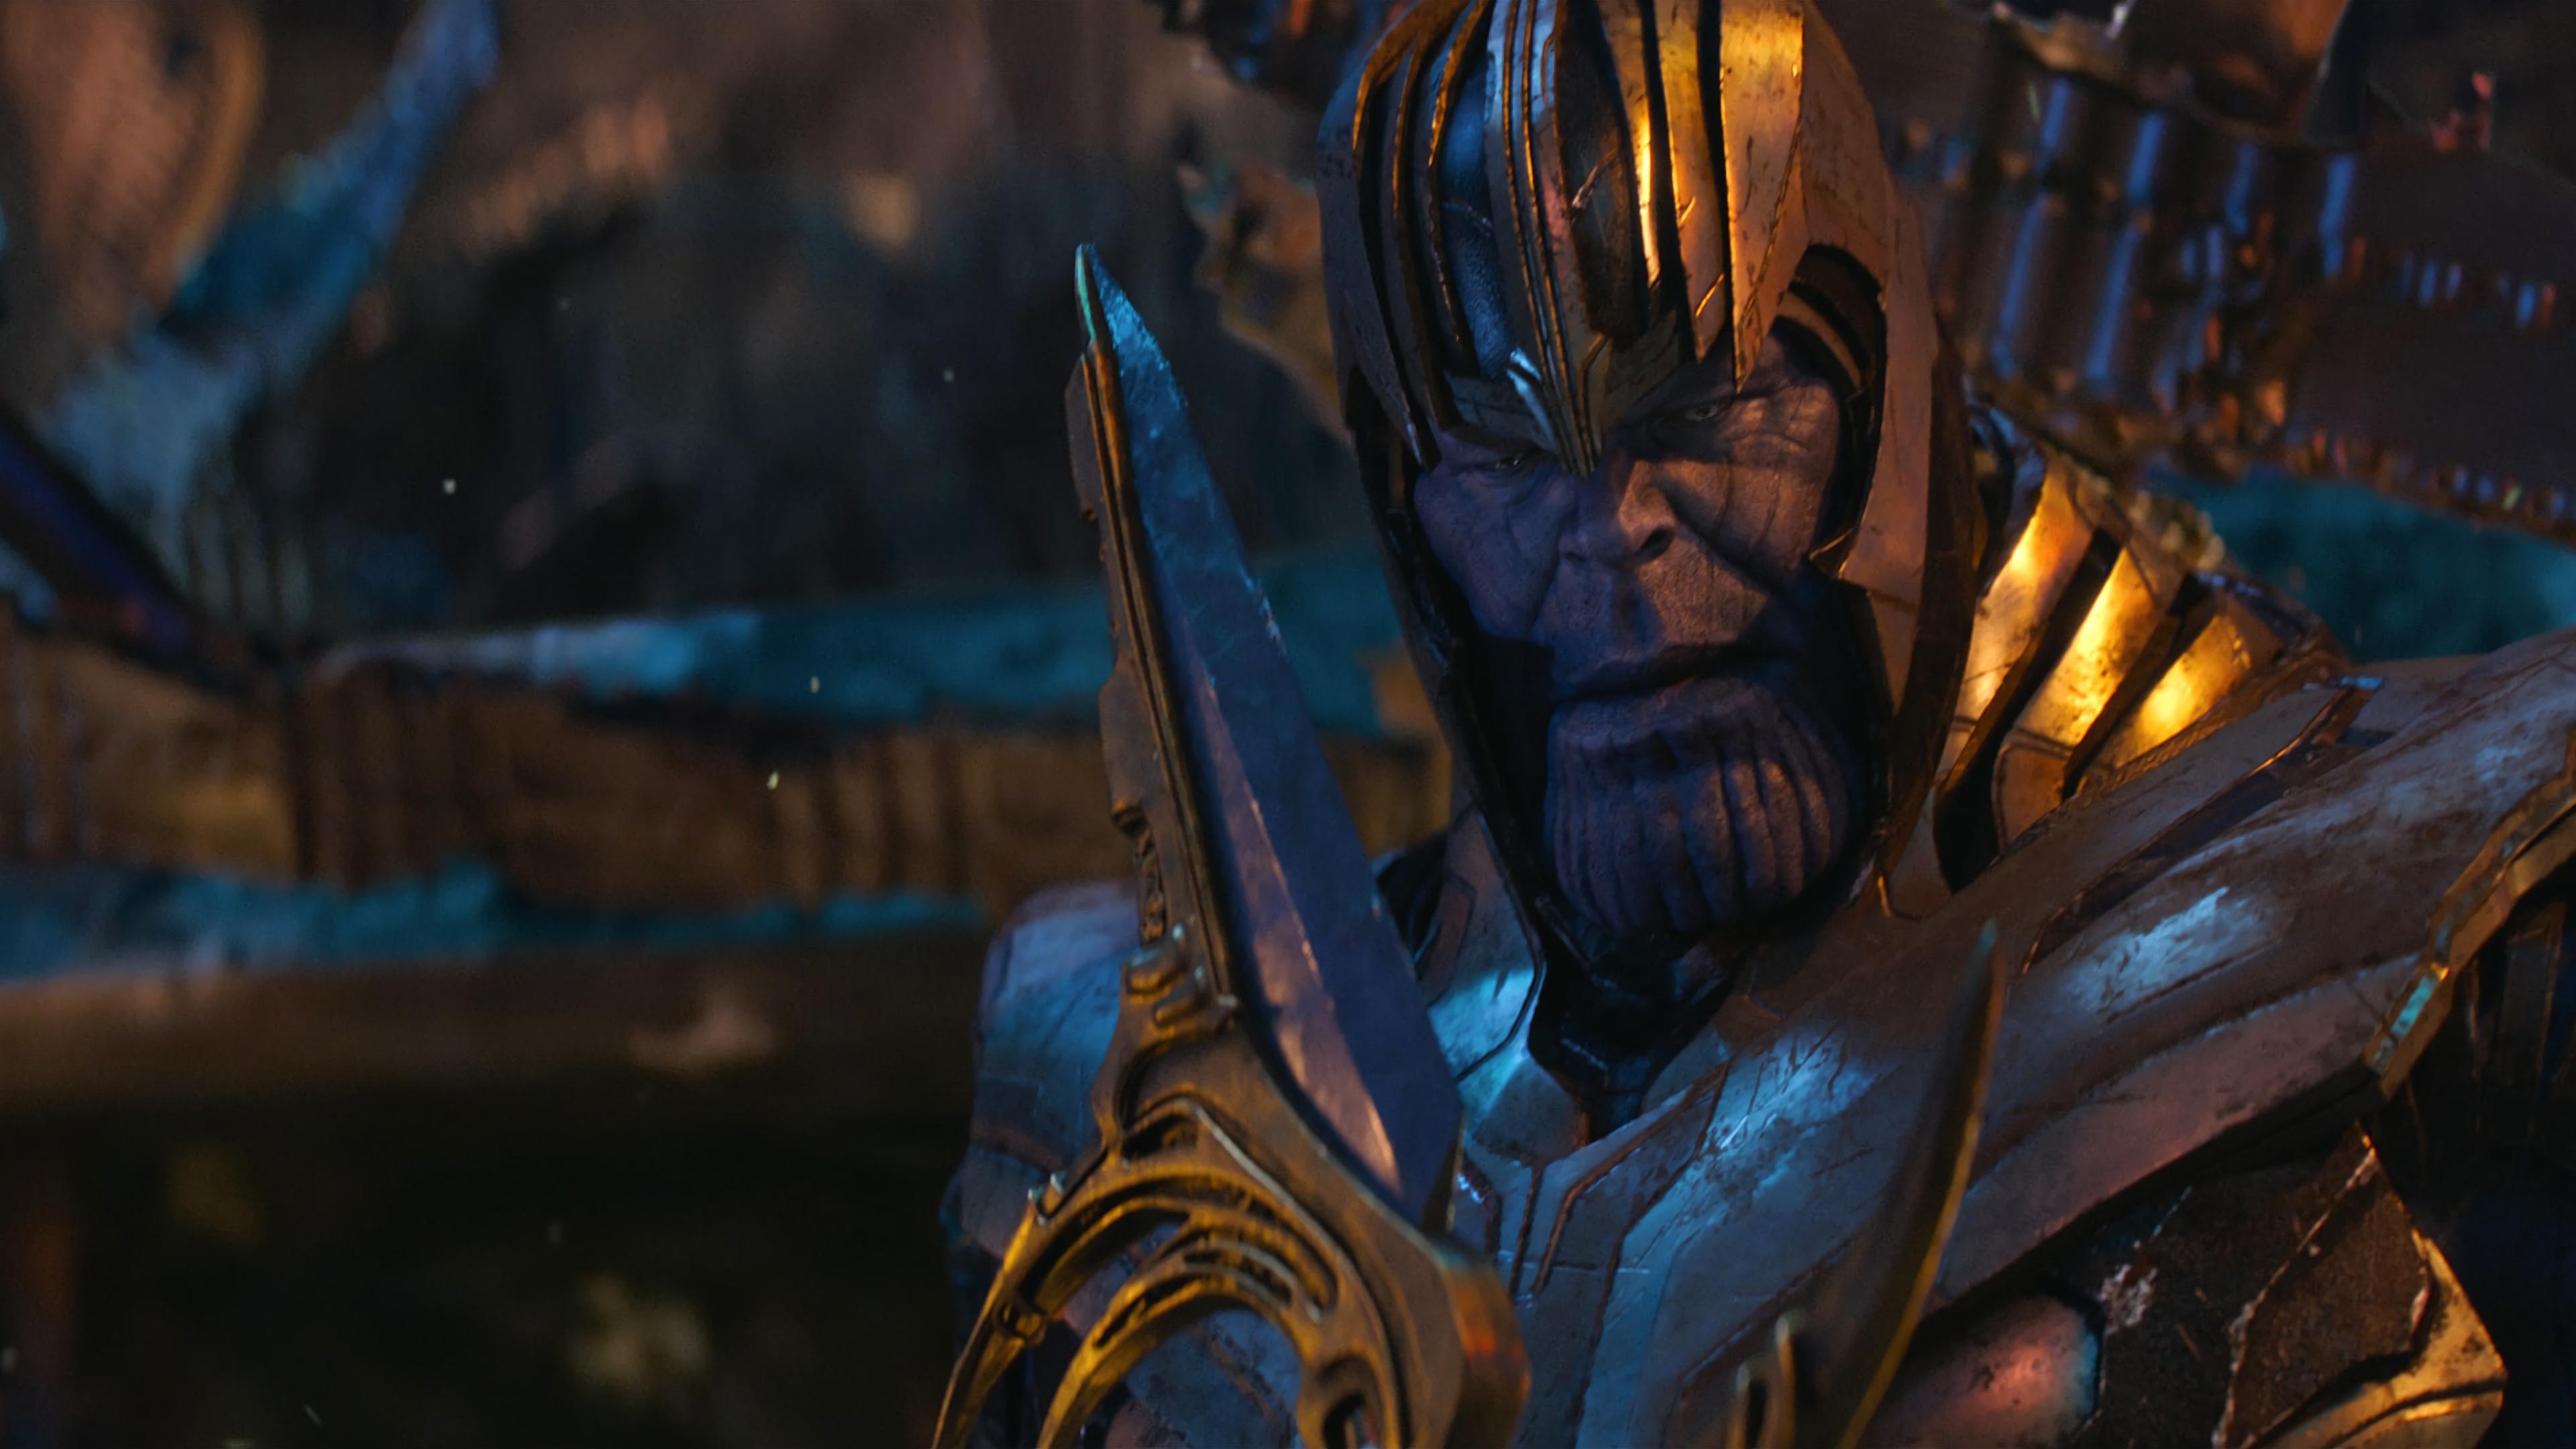 thanos war 4k wallpaper 1547507242 - Thanos War 4K Wallpaper - Thanos, Avengers Infinity War